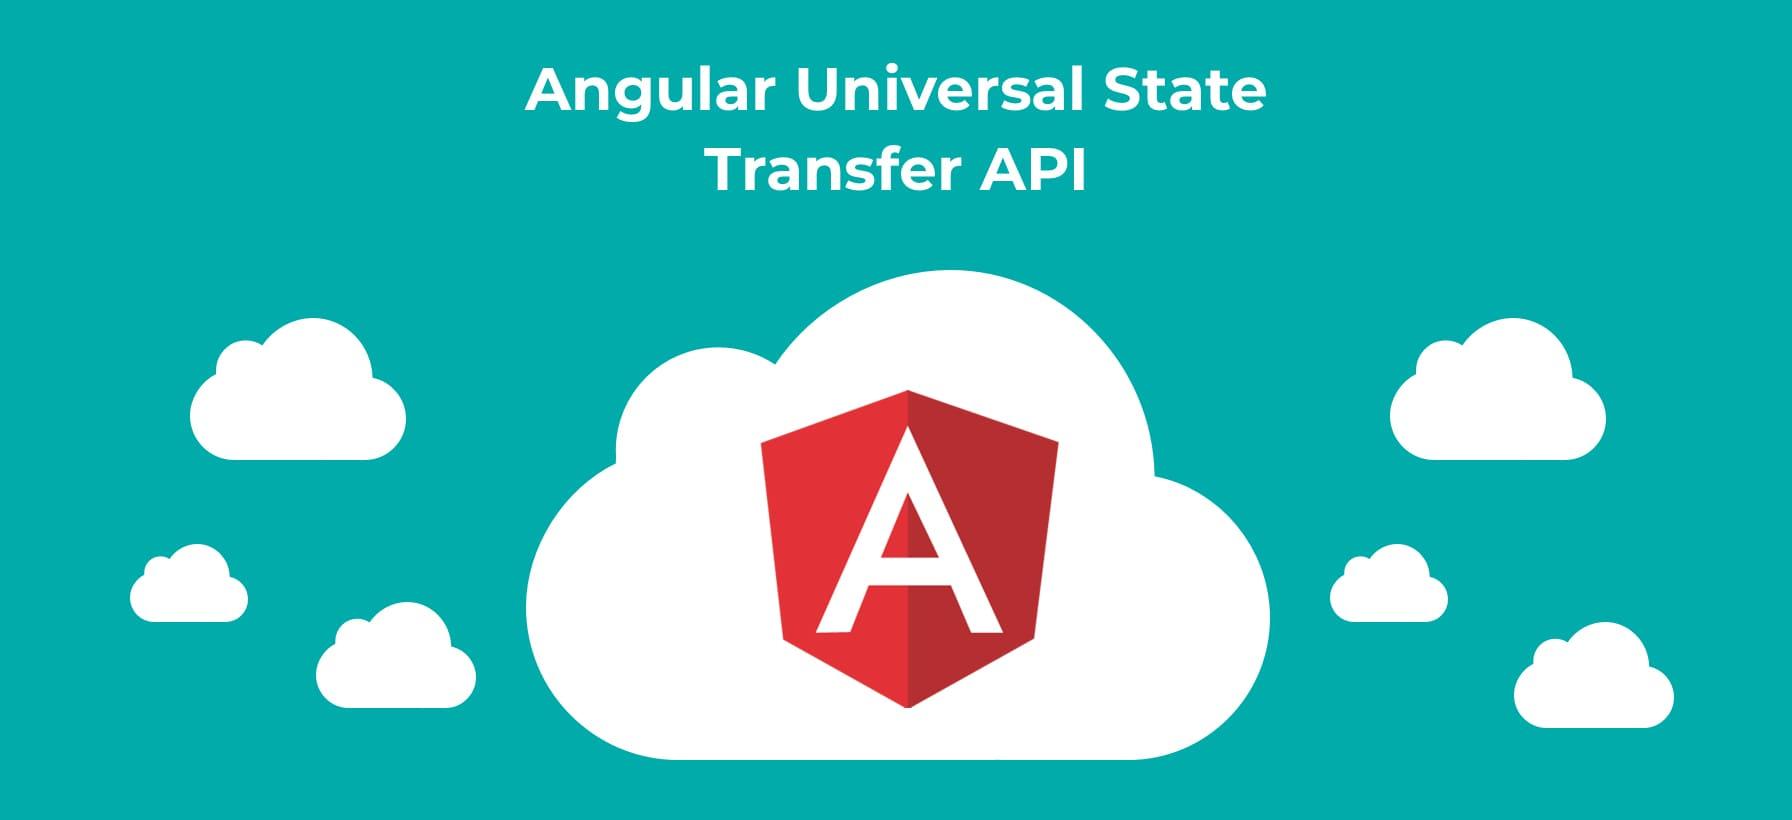 angular-universal-state-transfer-api-1--1-